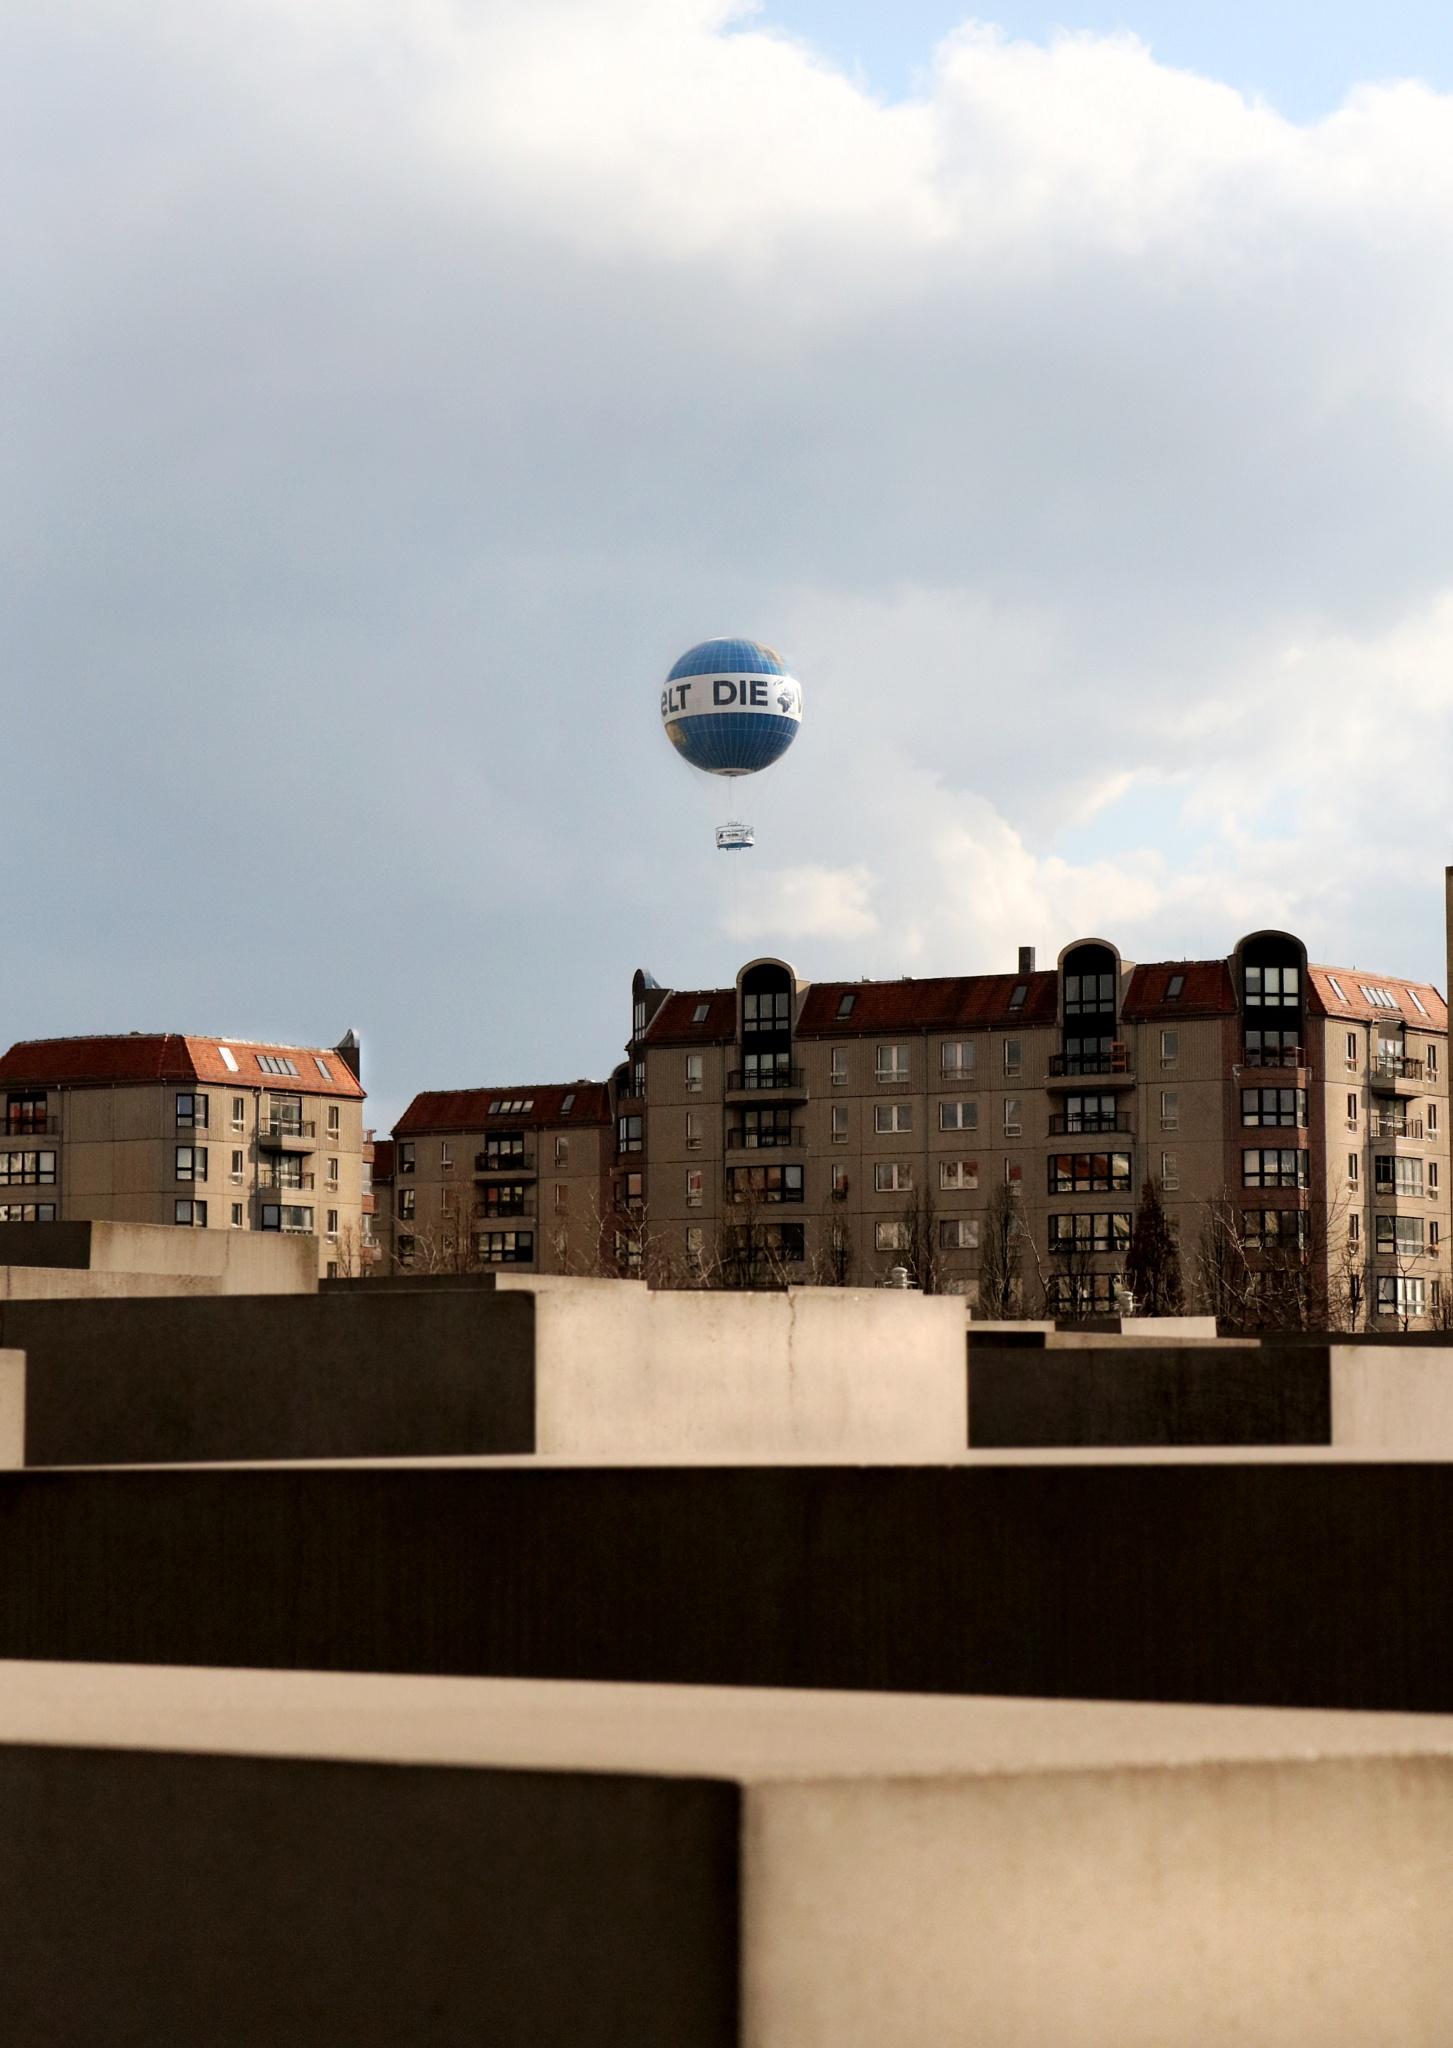 Luftballon by Kien Nguyen